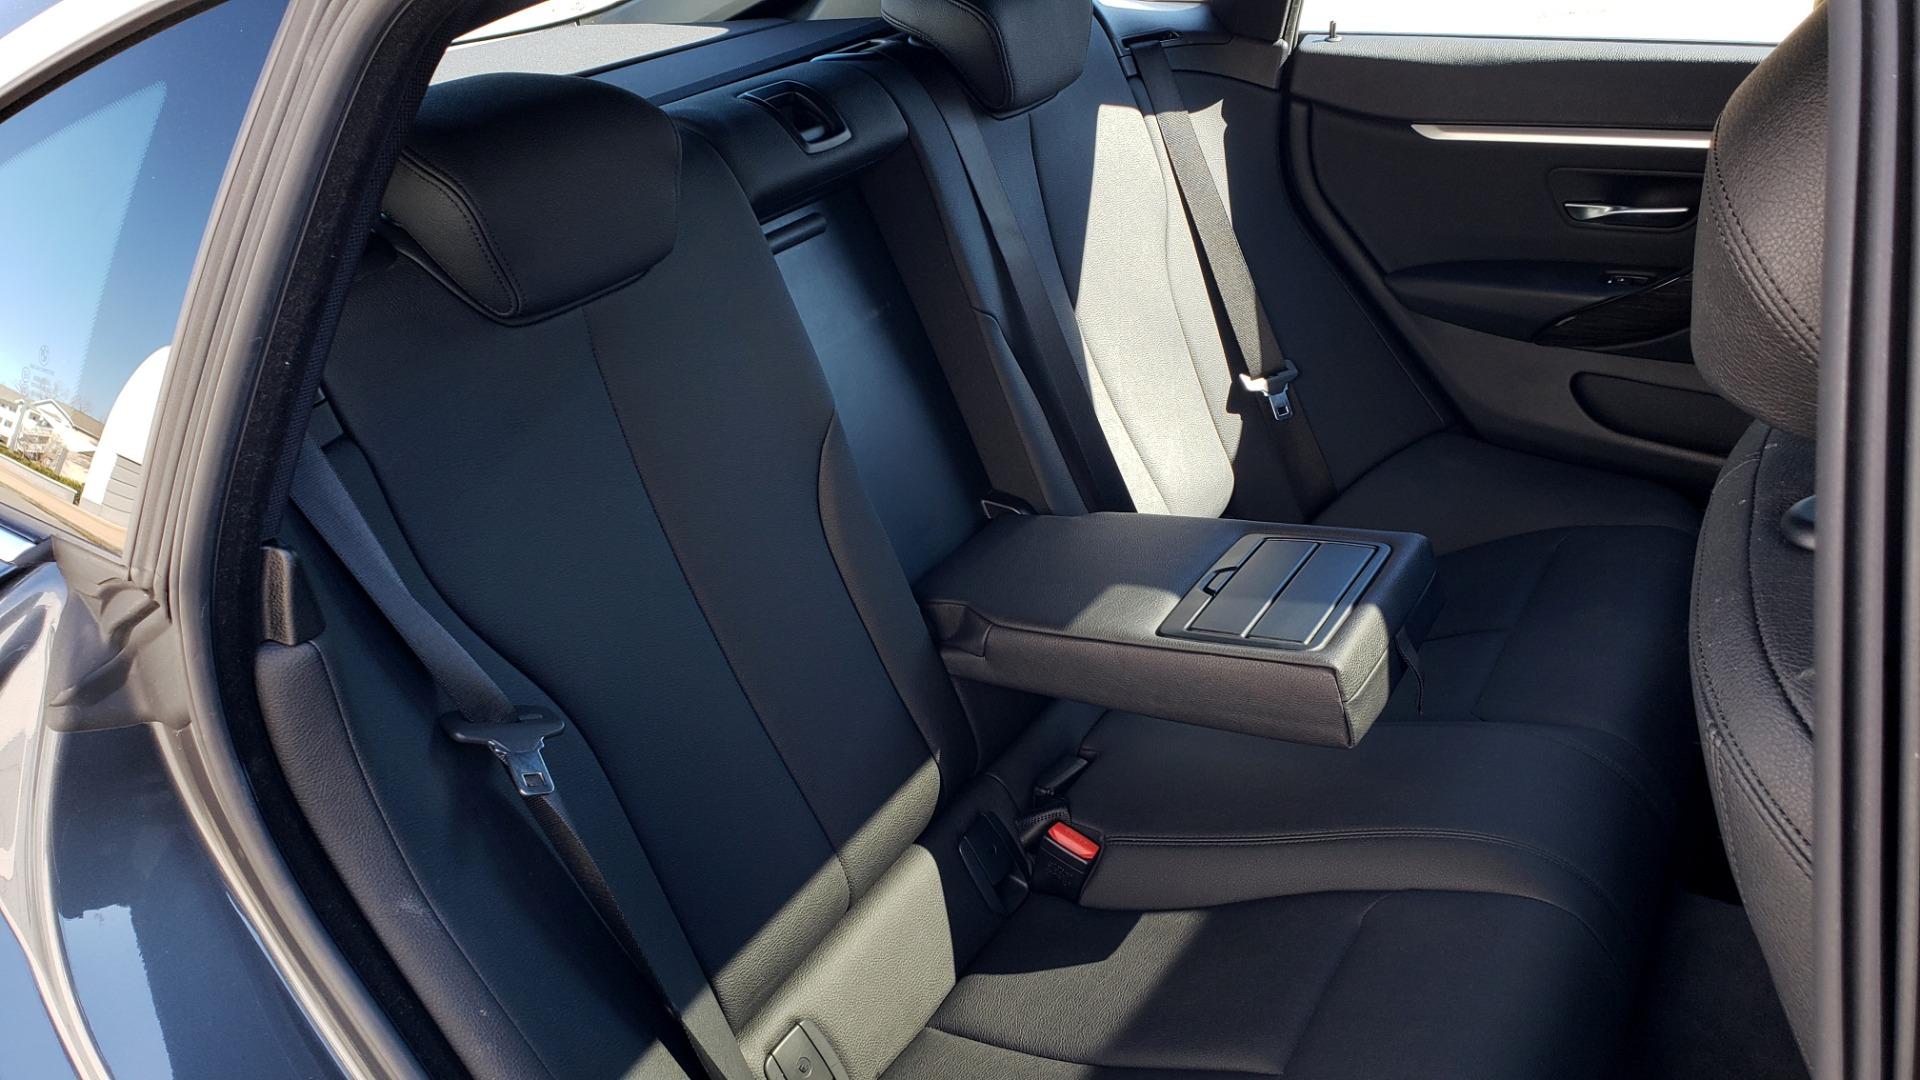 Used 2018 BMW 4 SERIES 430IXDRIVE / PREMIUM / NAV / SUNROOF / ESSENTIALS PKG for sale $29,495 at Formula Imports in Charlotte NC 28227 72